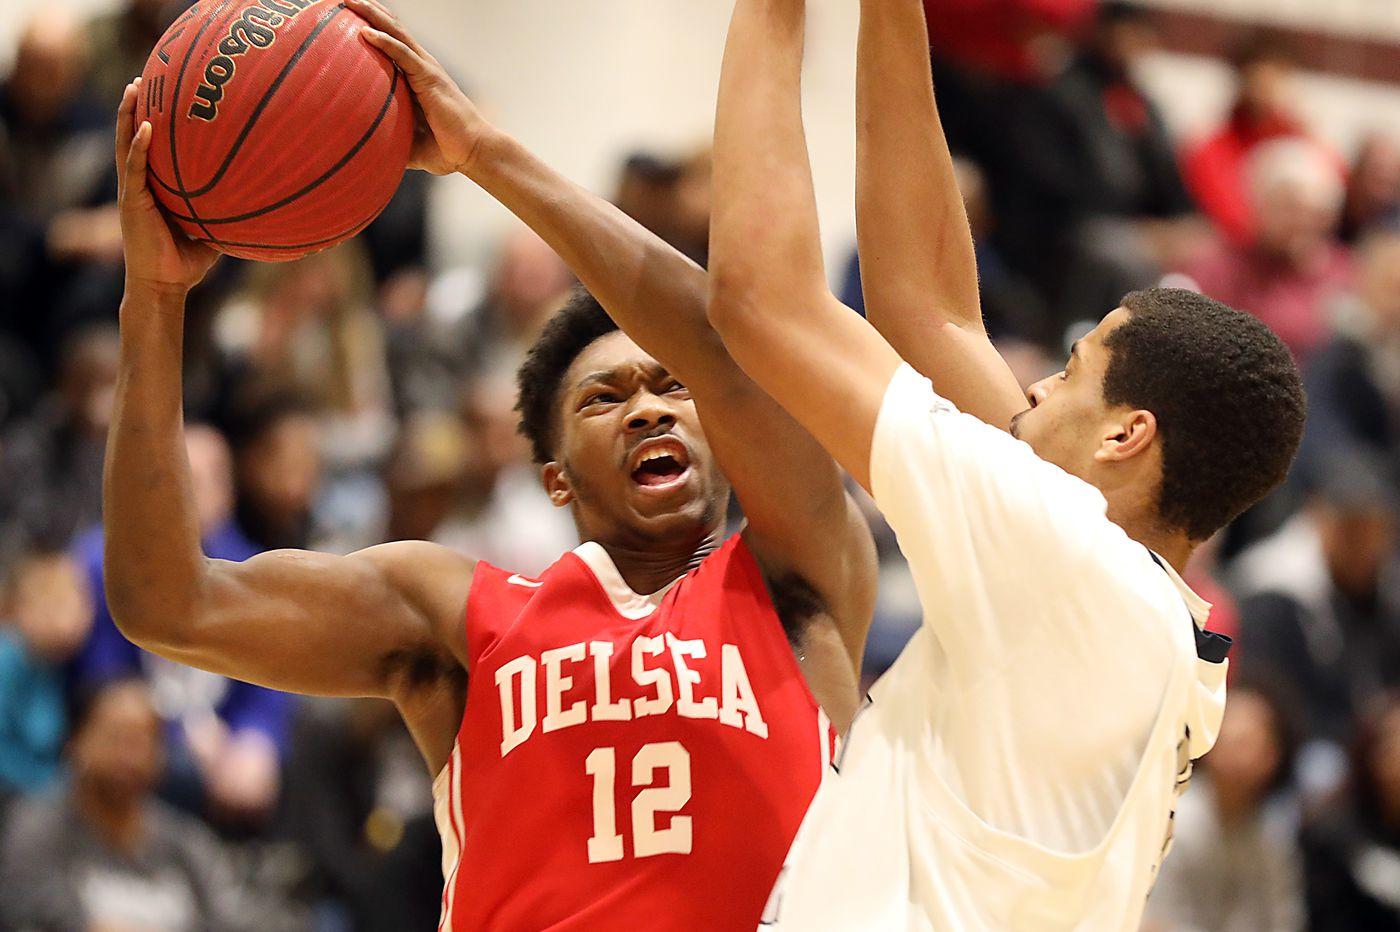 Friday's South Jersey roundup: Javon Gordon stuffs the stat sheet in Delsea boys' basketball win over Oakcrest